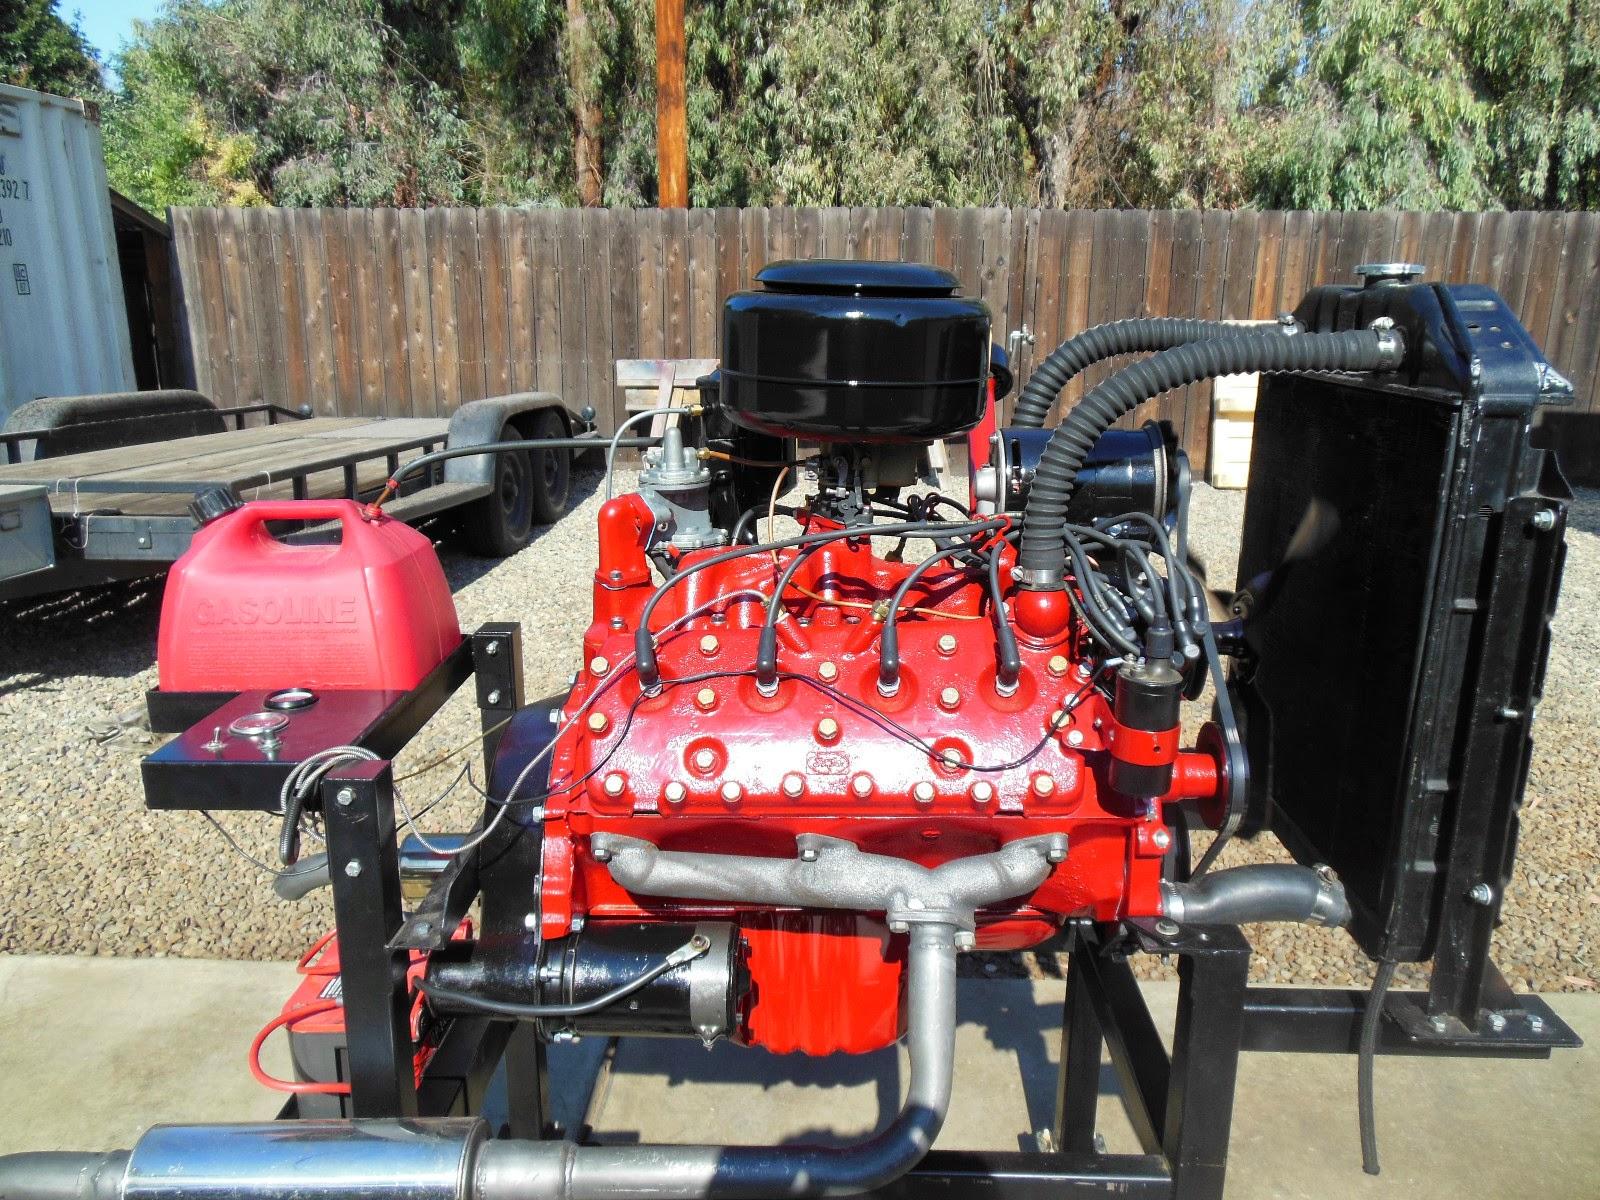 flathead ford engines internal diagrams wiring diagram flathead ford engines internal diagrams [ 1600 x 1200 Pixel ]